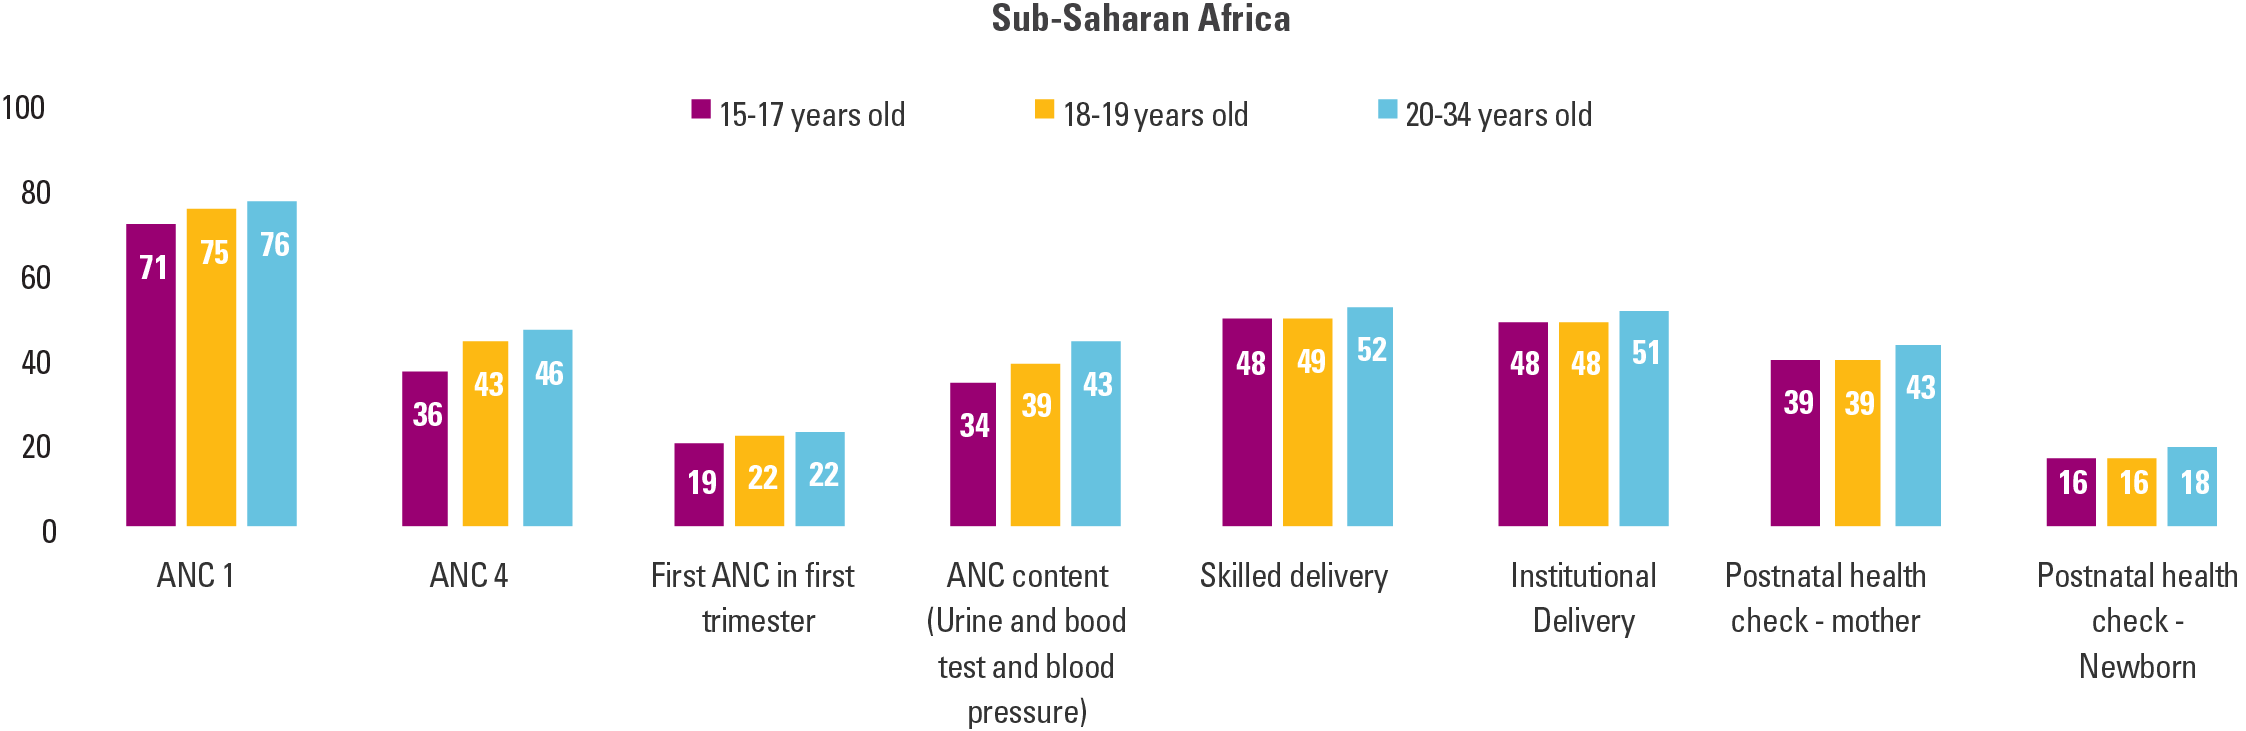 Adolescent Health - Unicef Data-4794